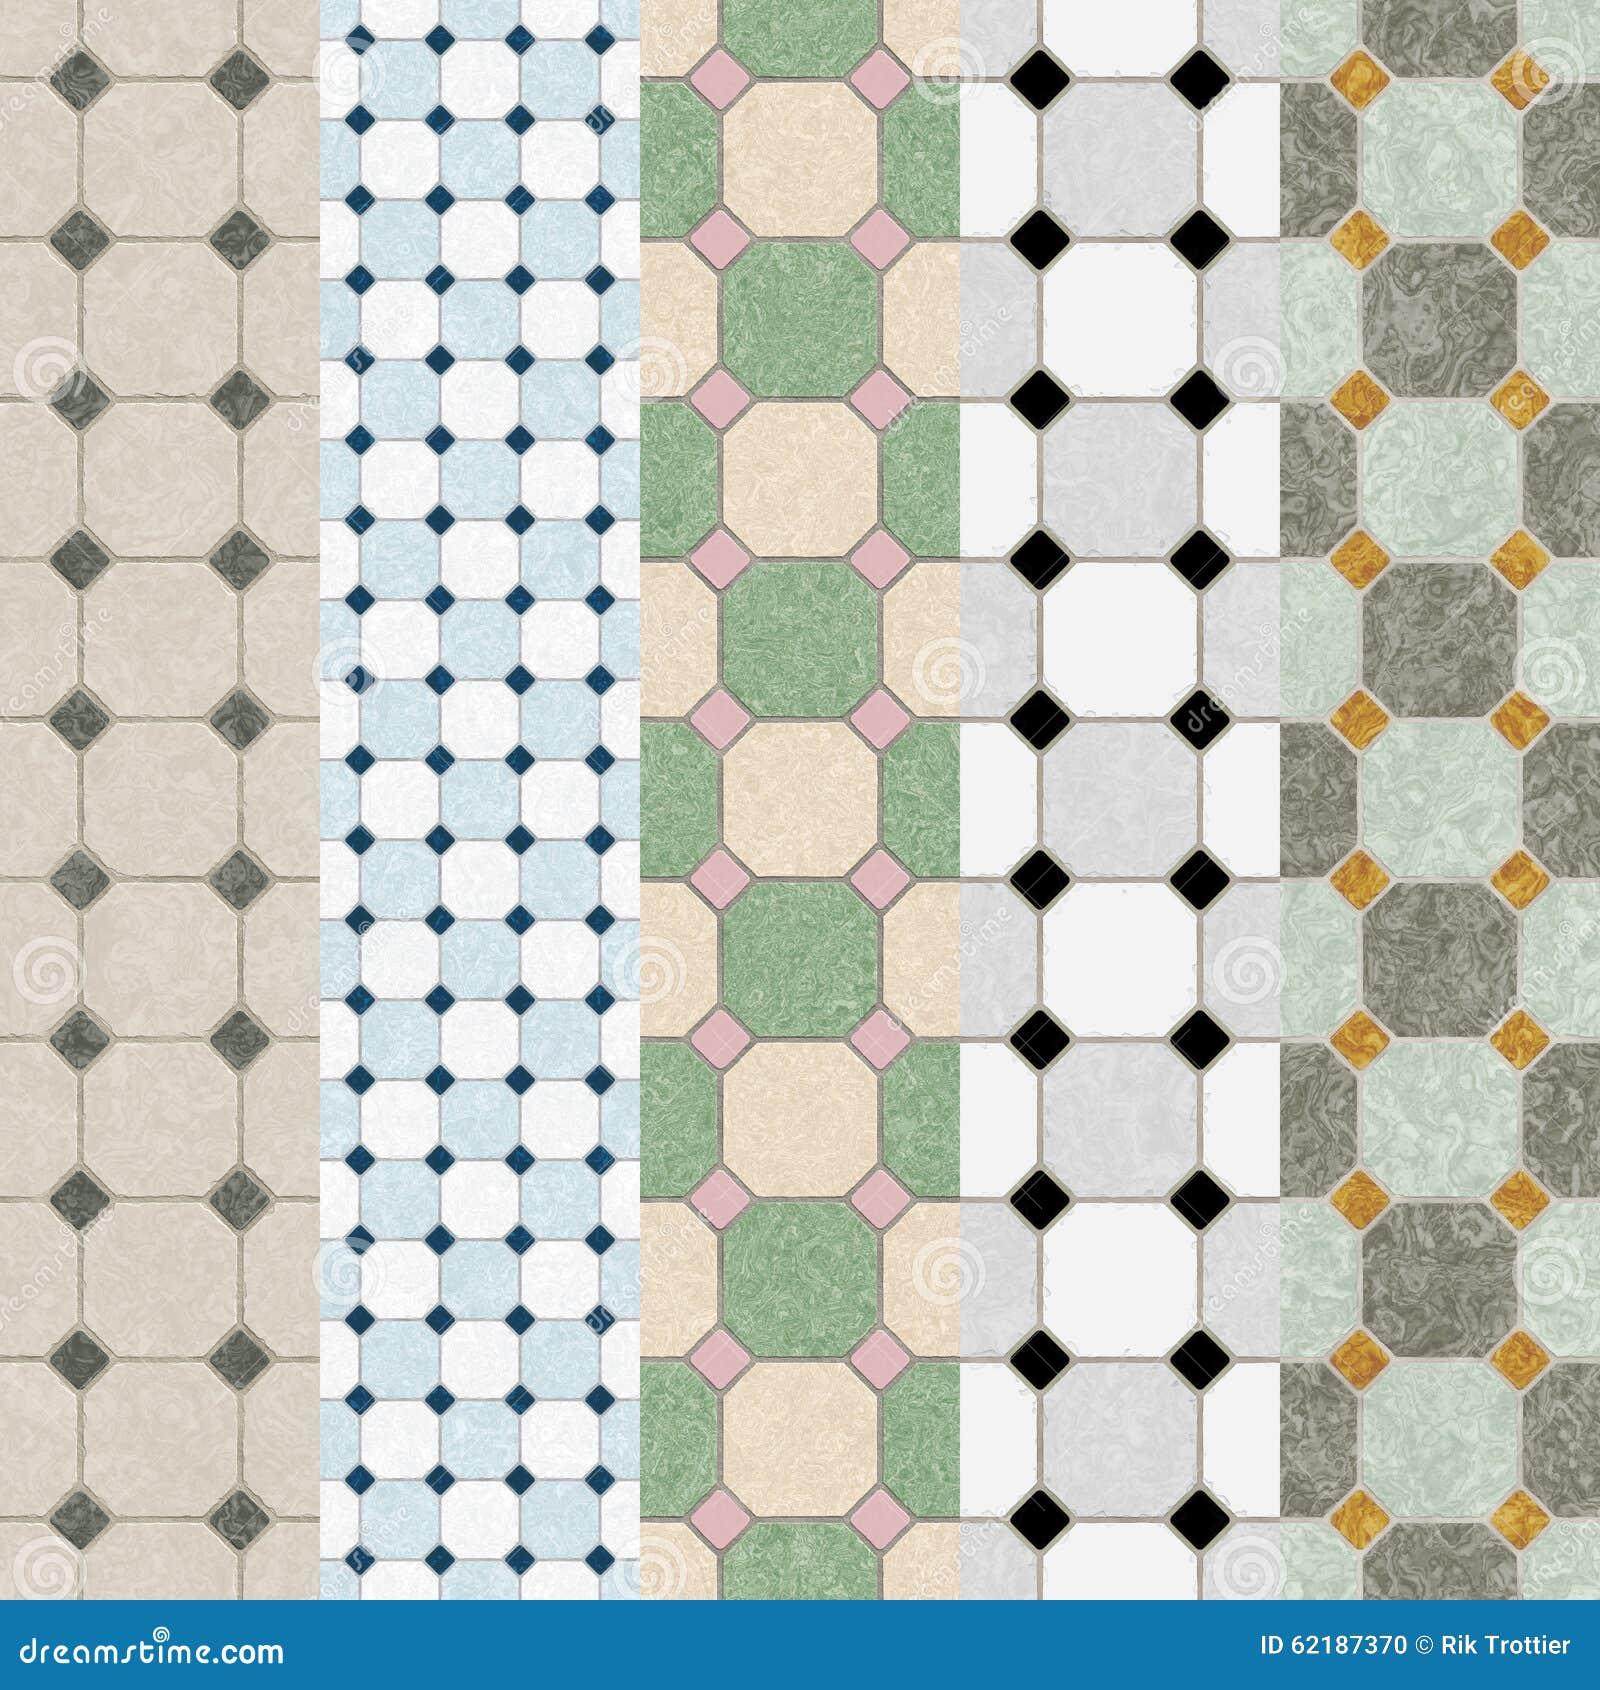 ceramic tile samples stock illustration image 62187370